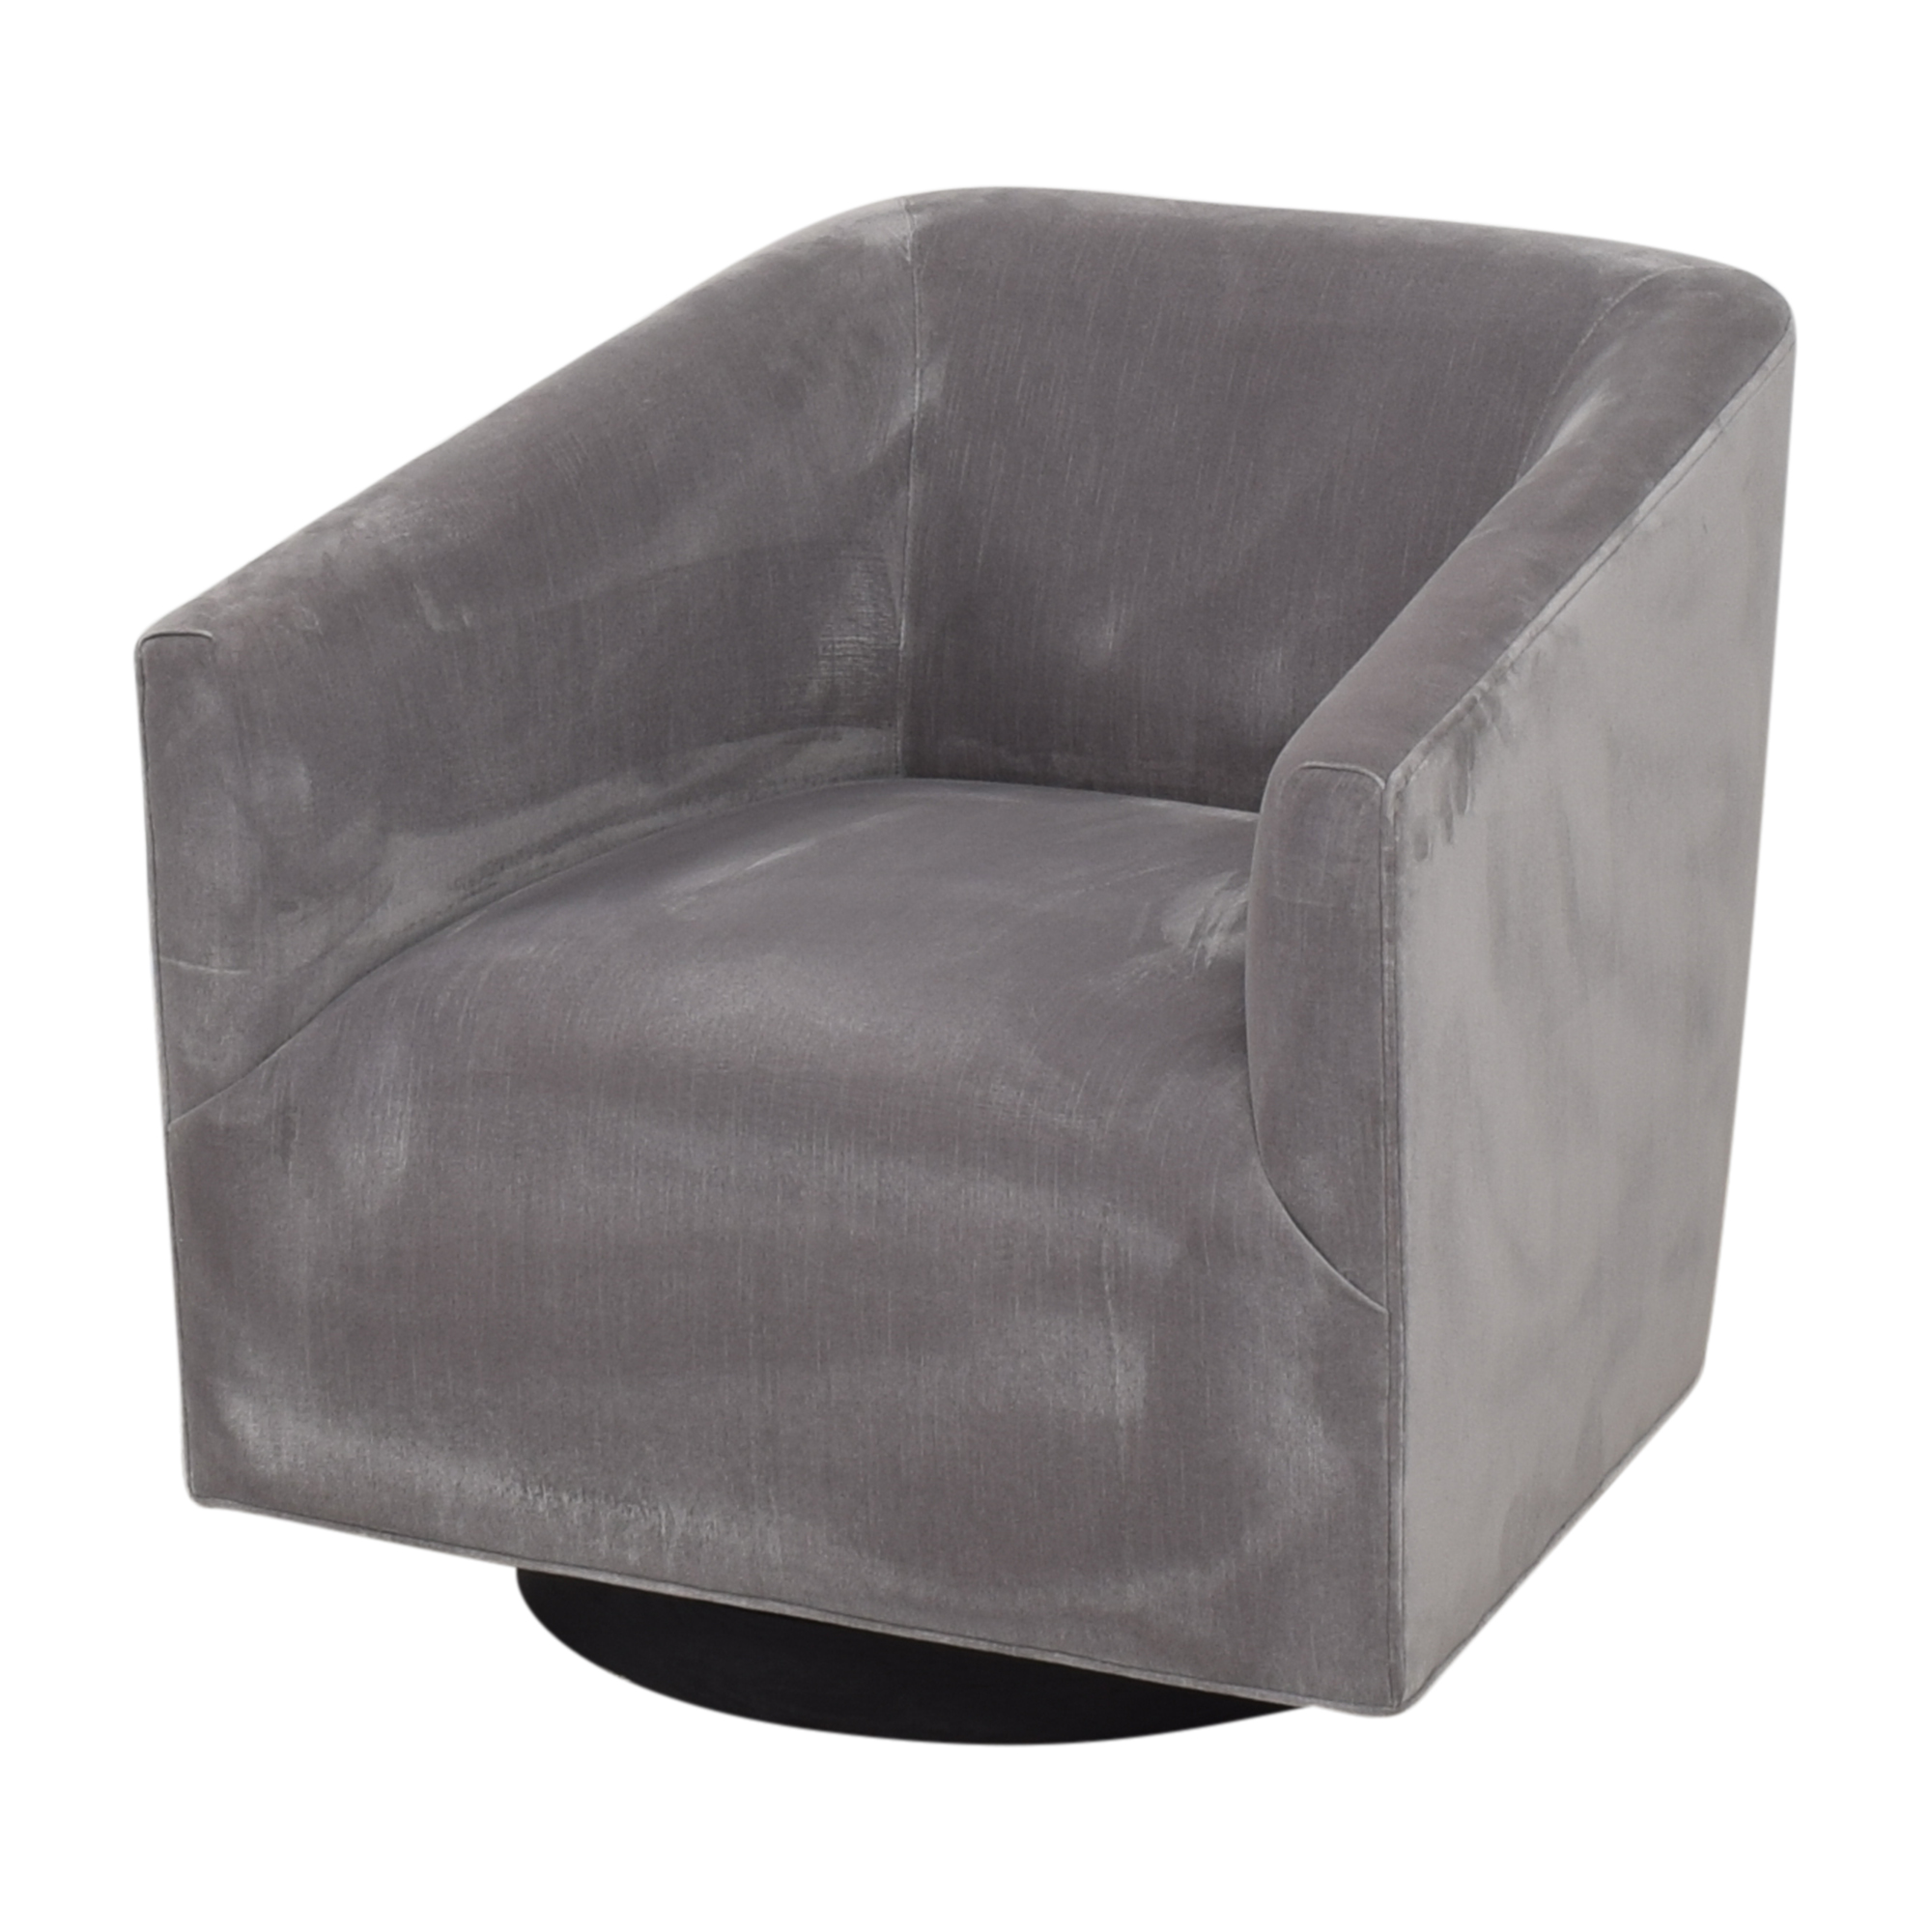 Restoration Hardware 1950s Italian Shelter Arm Swivel Chair sale